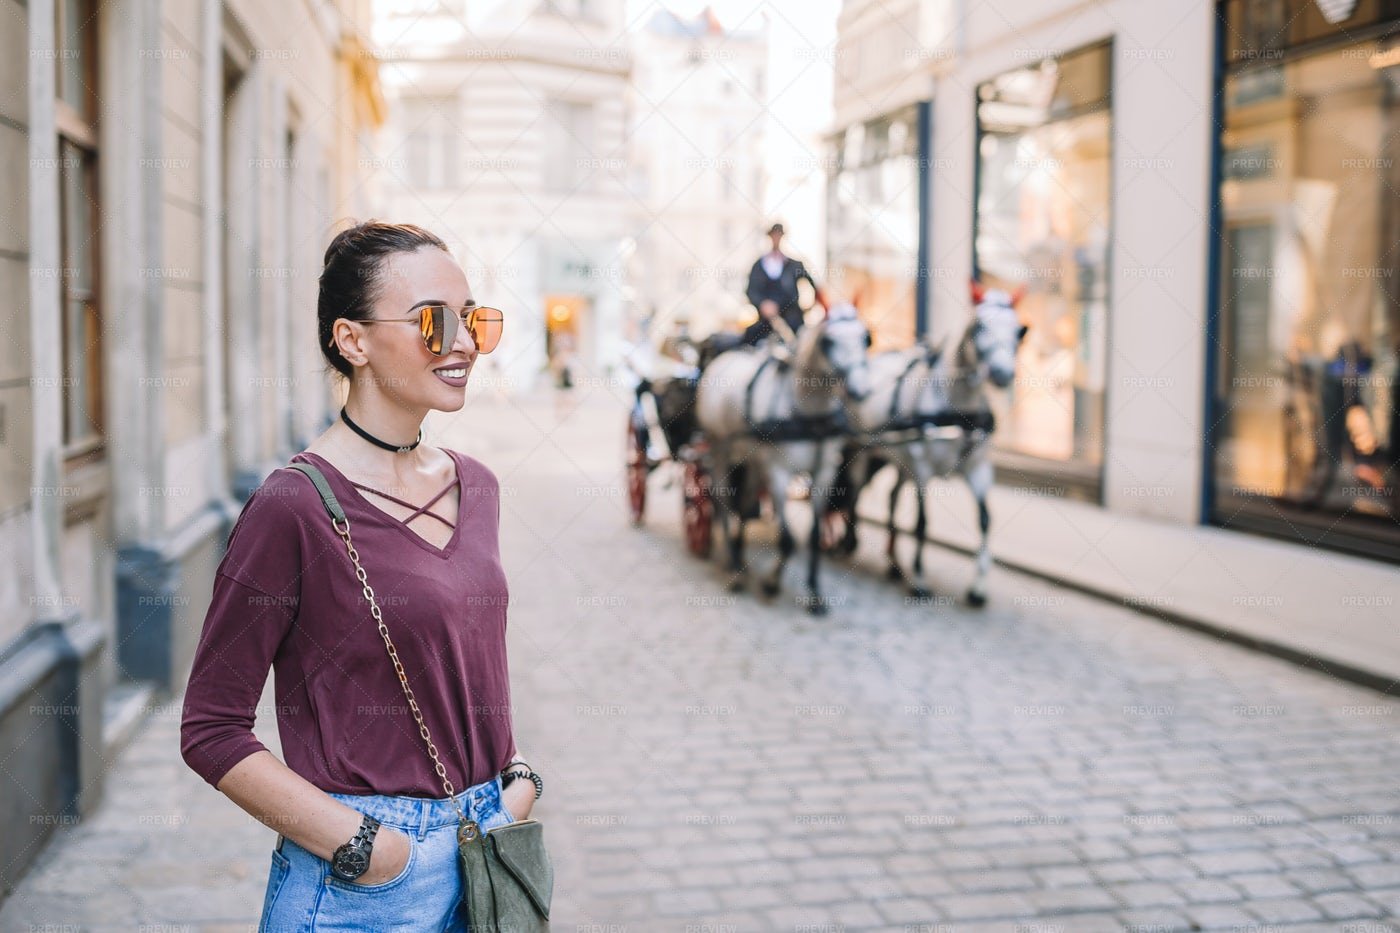 Horse Drawn Carriage On Vienna Street: Stock Photos